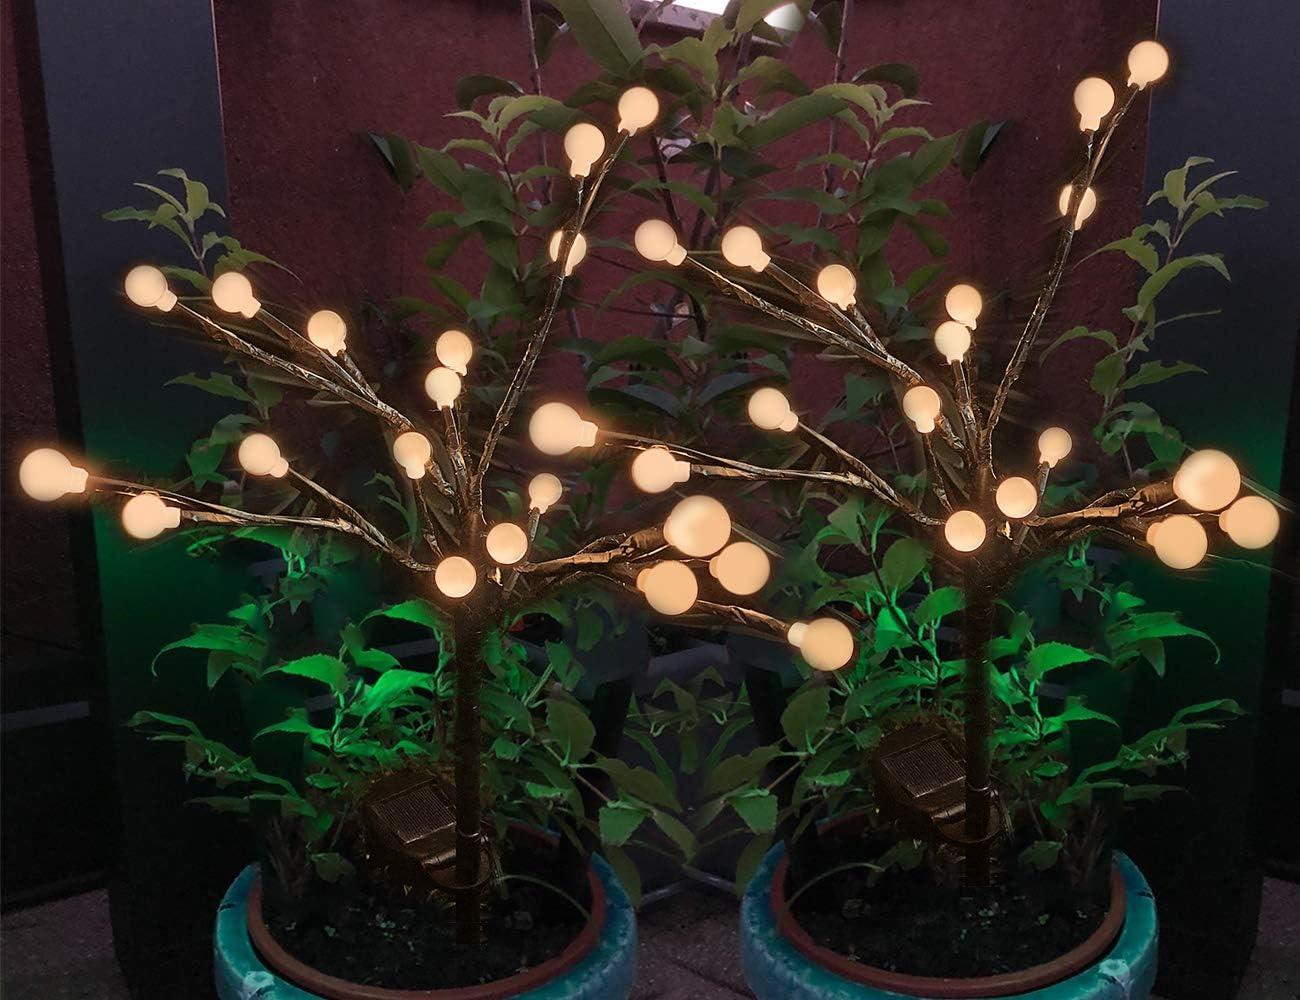 Juego de 3 L/ámparas Solares Luces De Exterior Jardin Luz Solar Jard/ín IP65 Impermeable L/ámpara de Decoraci/ón Solar para Jard/ín Terraza 30LED Luces de Hadas Garaje Patio Luces de Jardin Solares